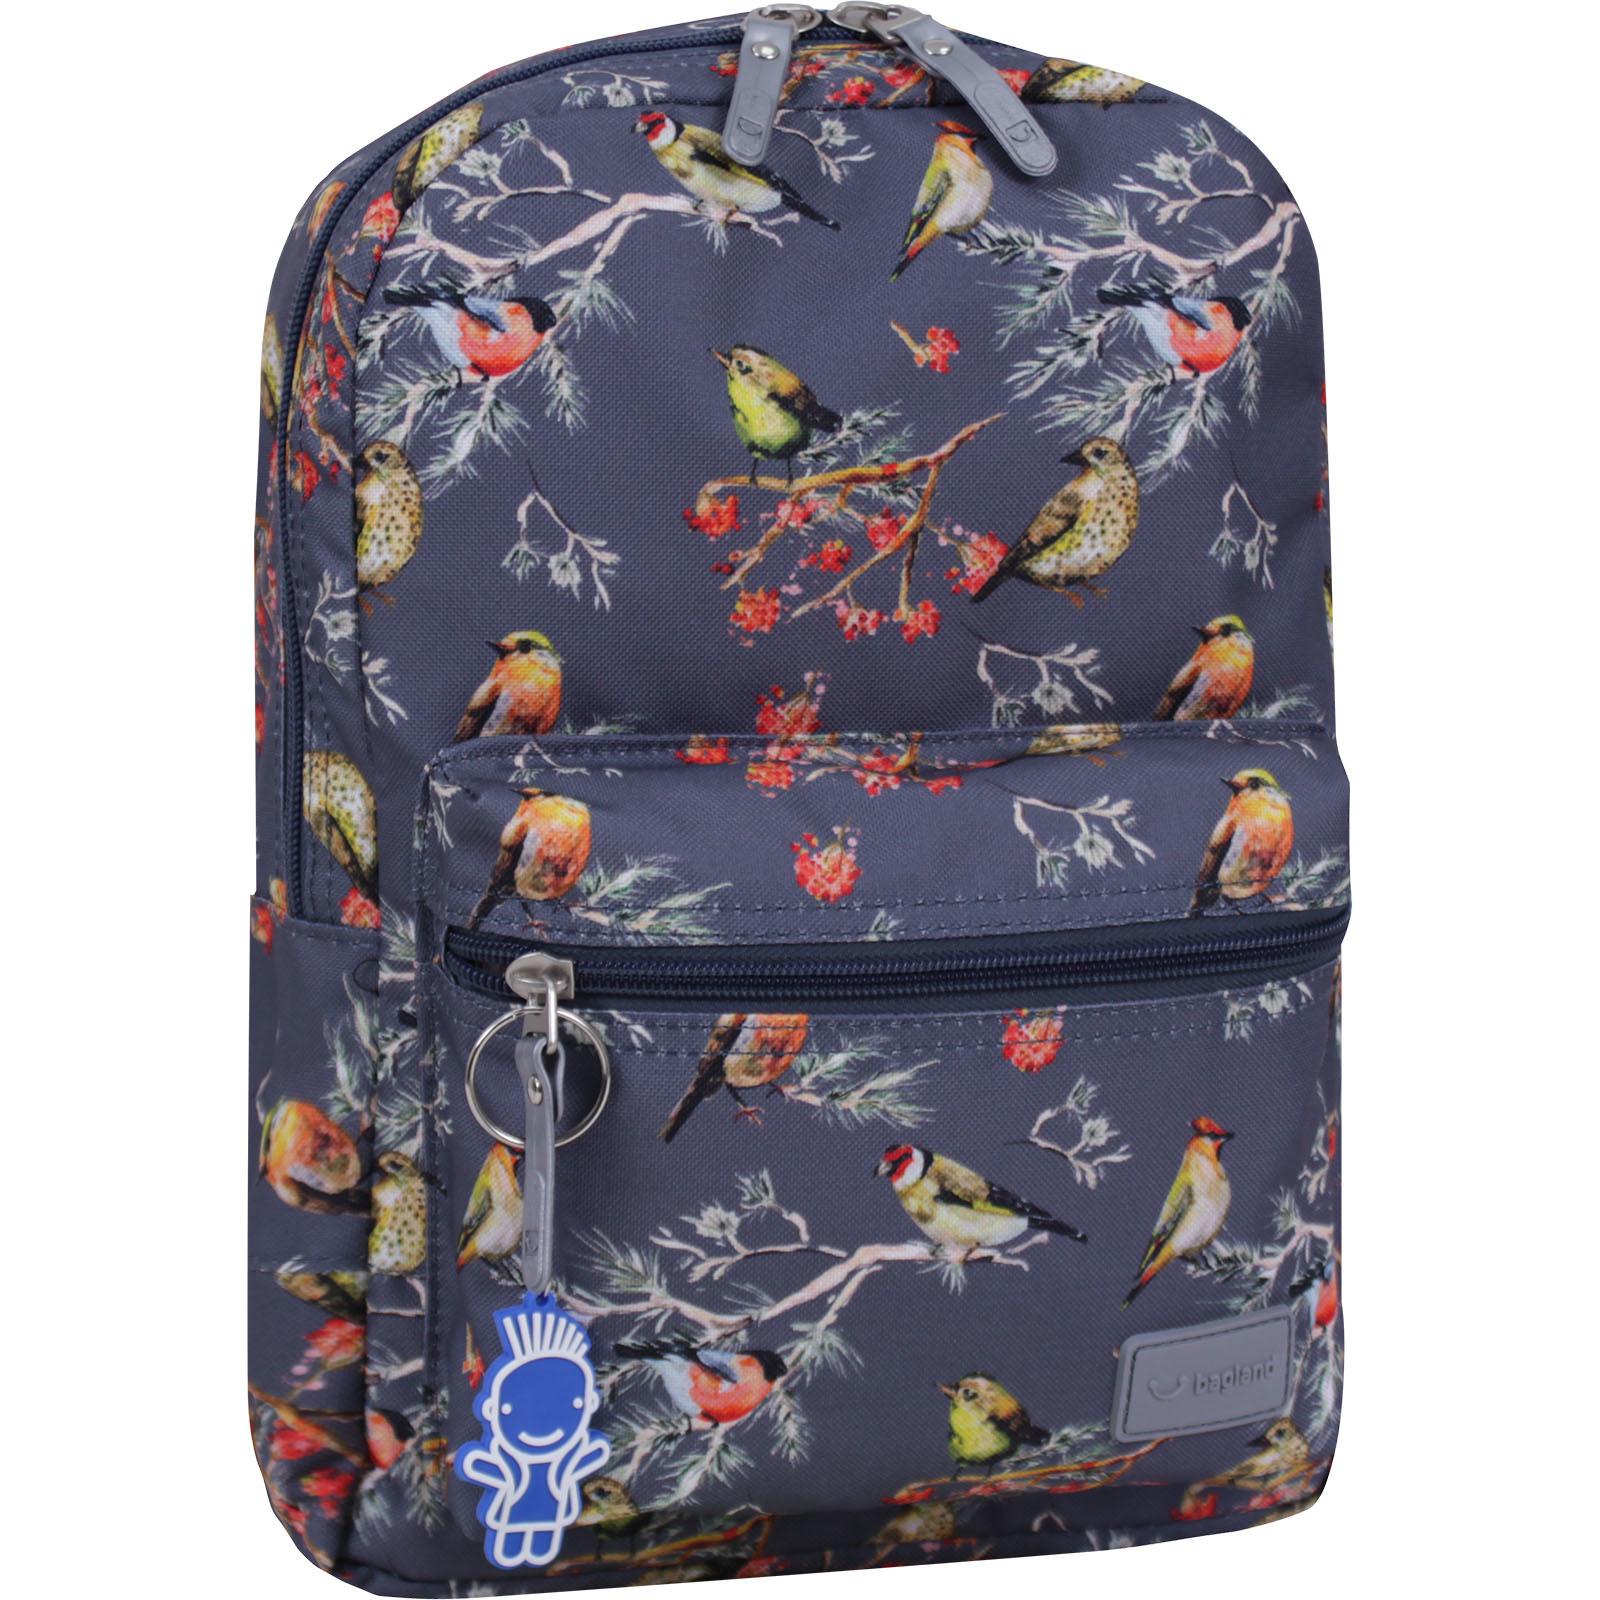 Детские рюкзаки Рюкзак Bagland Молодежный mini 8 л. сублімація 445 (00508664) IMG_8223суб445-1600.jpg